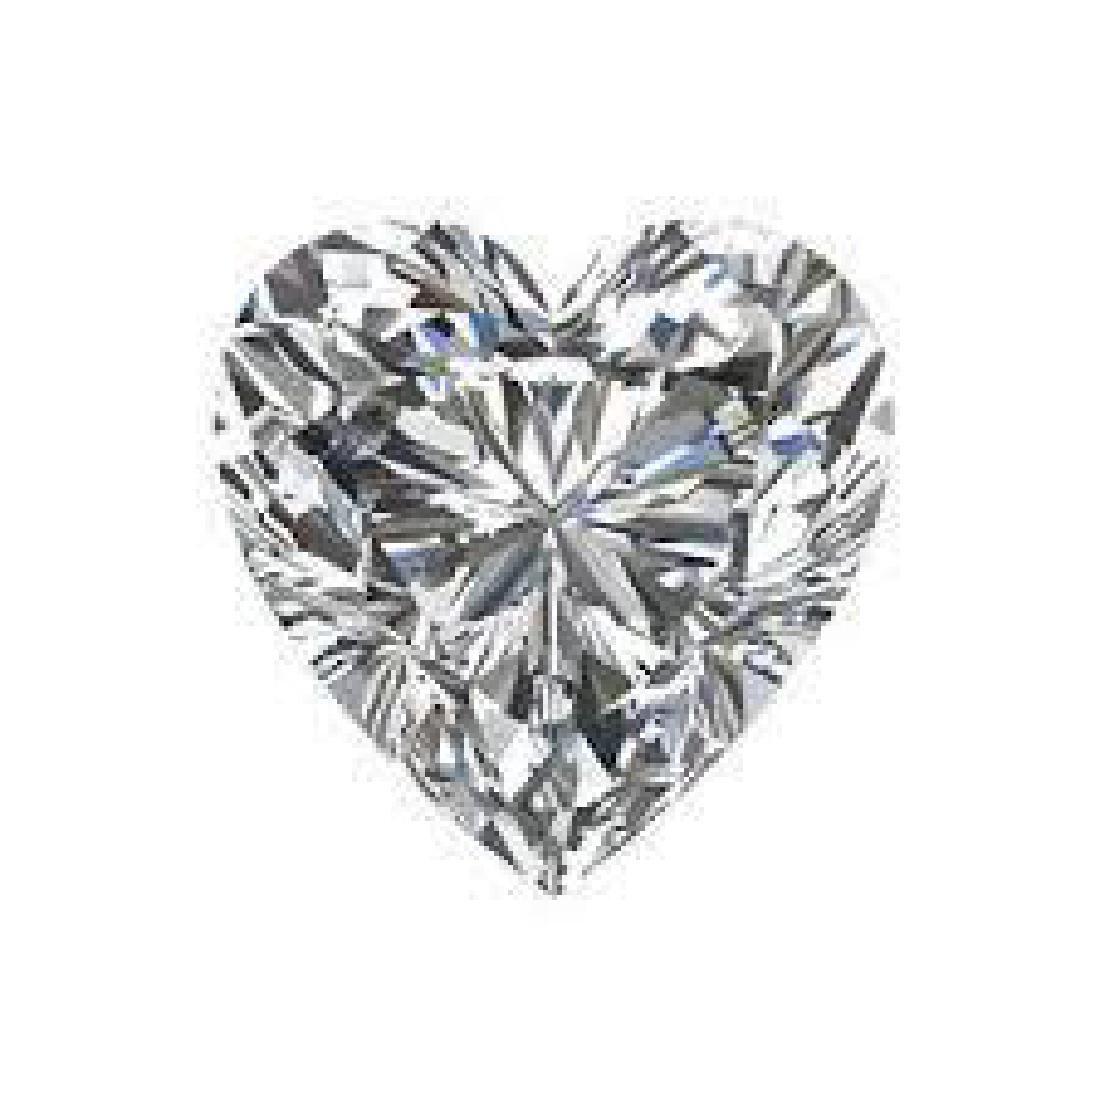 10 carat Heart Facet BIANCO Diamond - 3